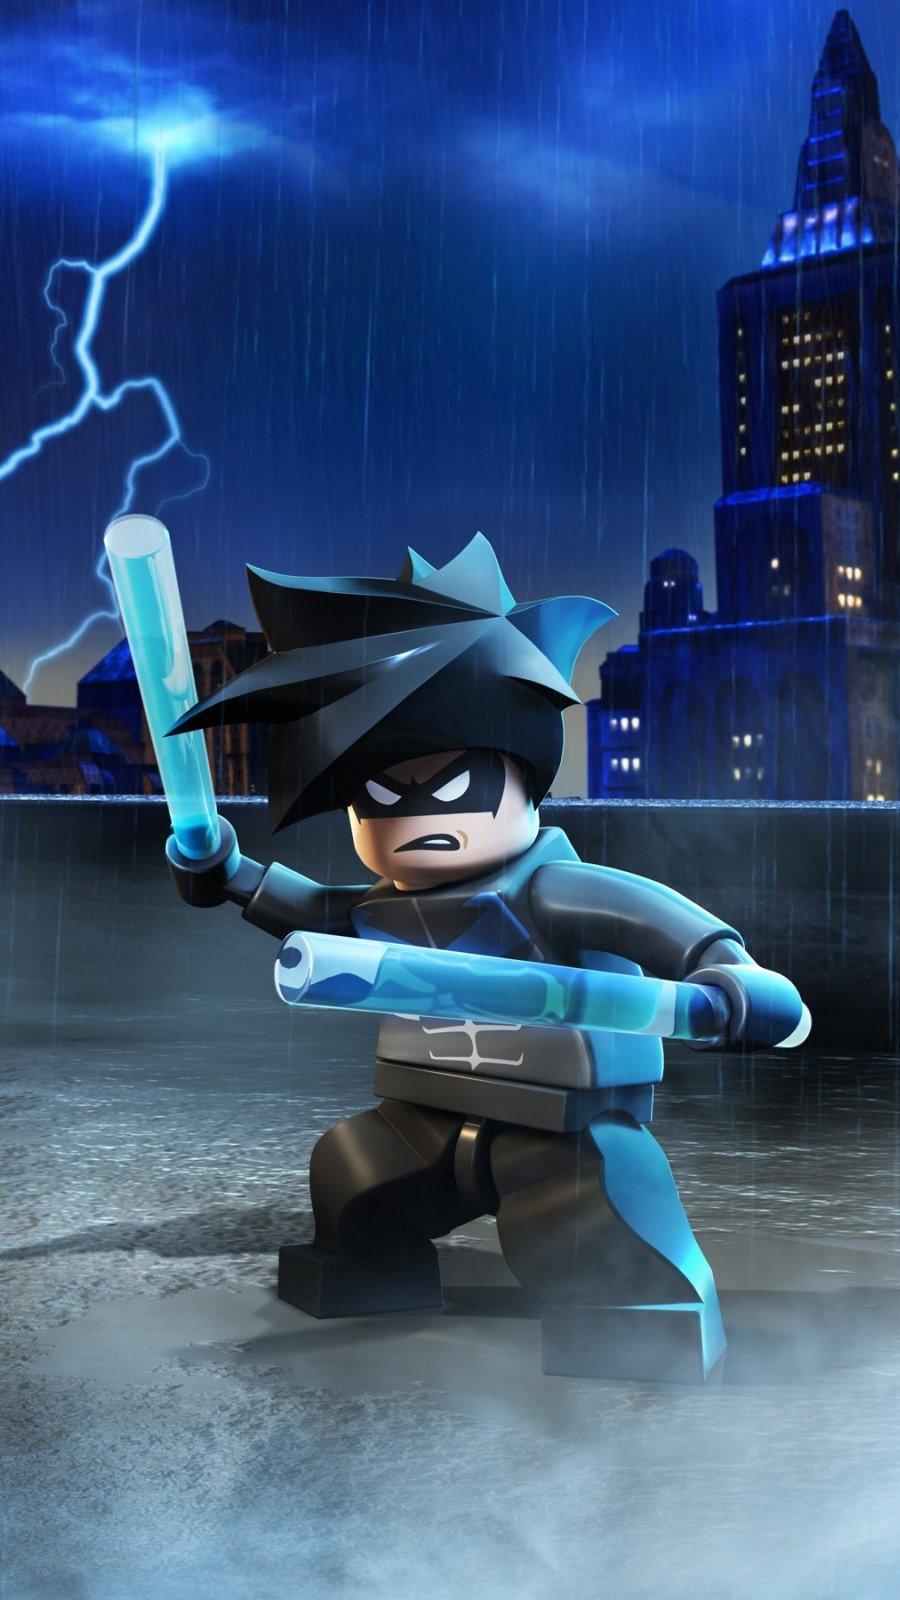 Fondos de pantalla Batman en Lego Vertical